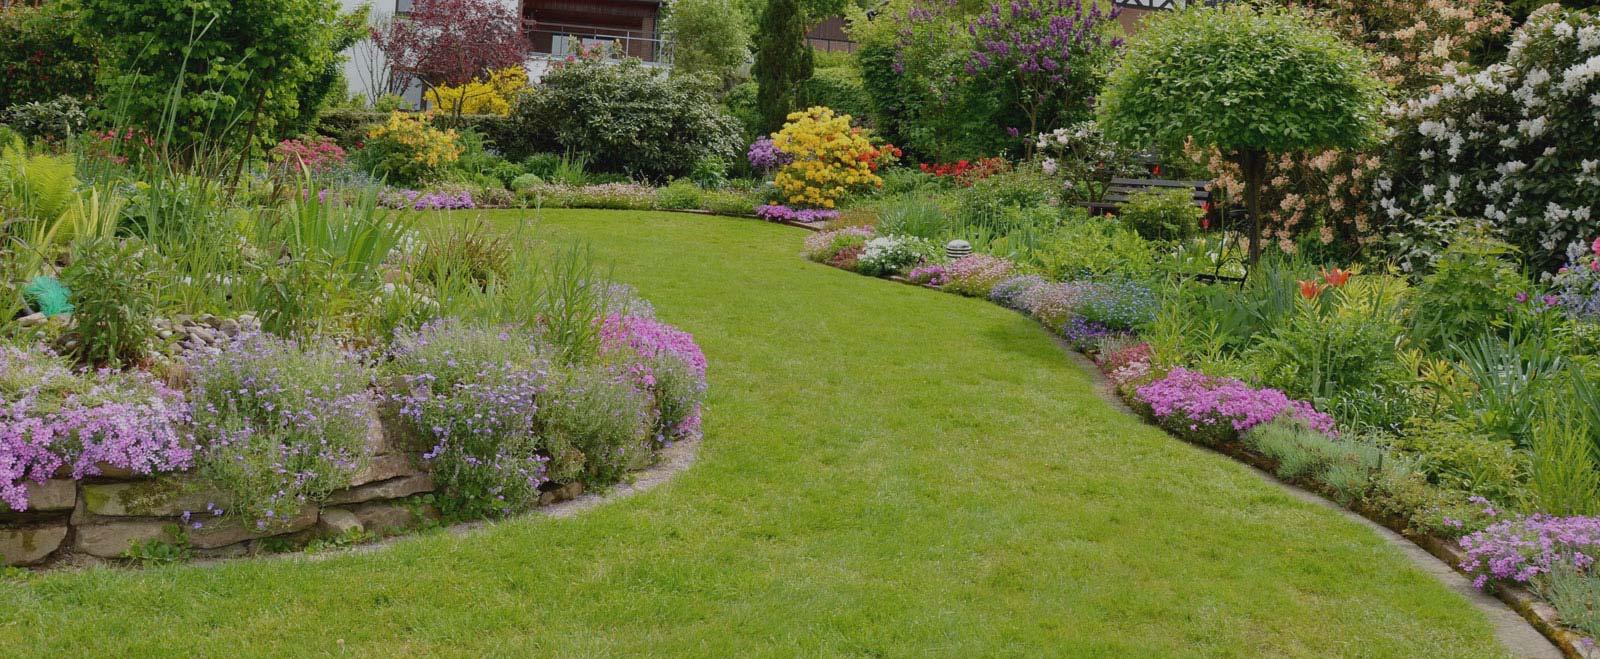 Brett Valley Landscaping And Garden Design Services